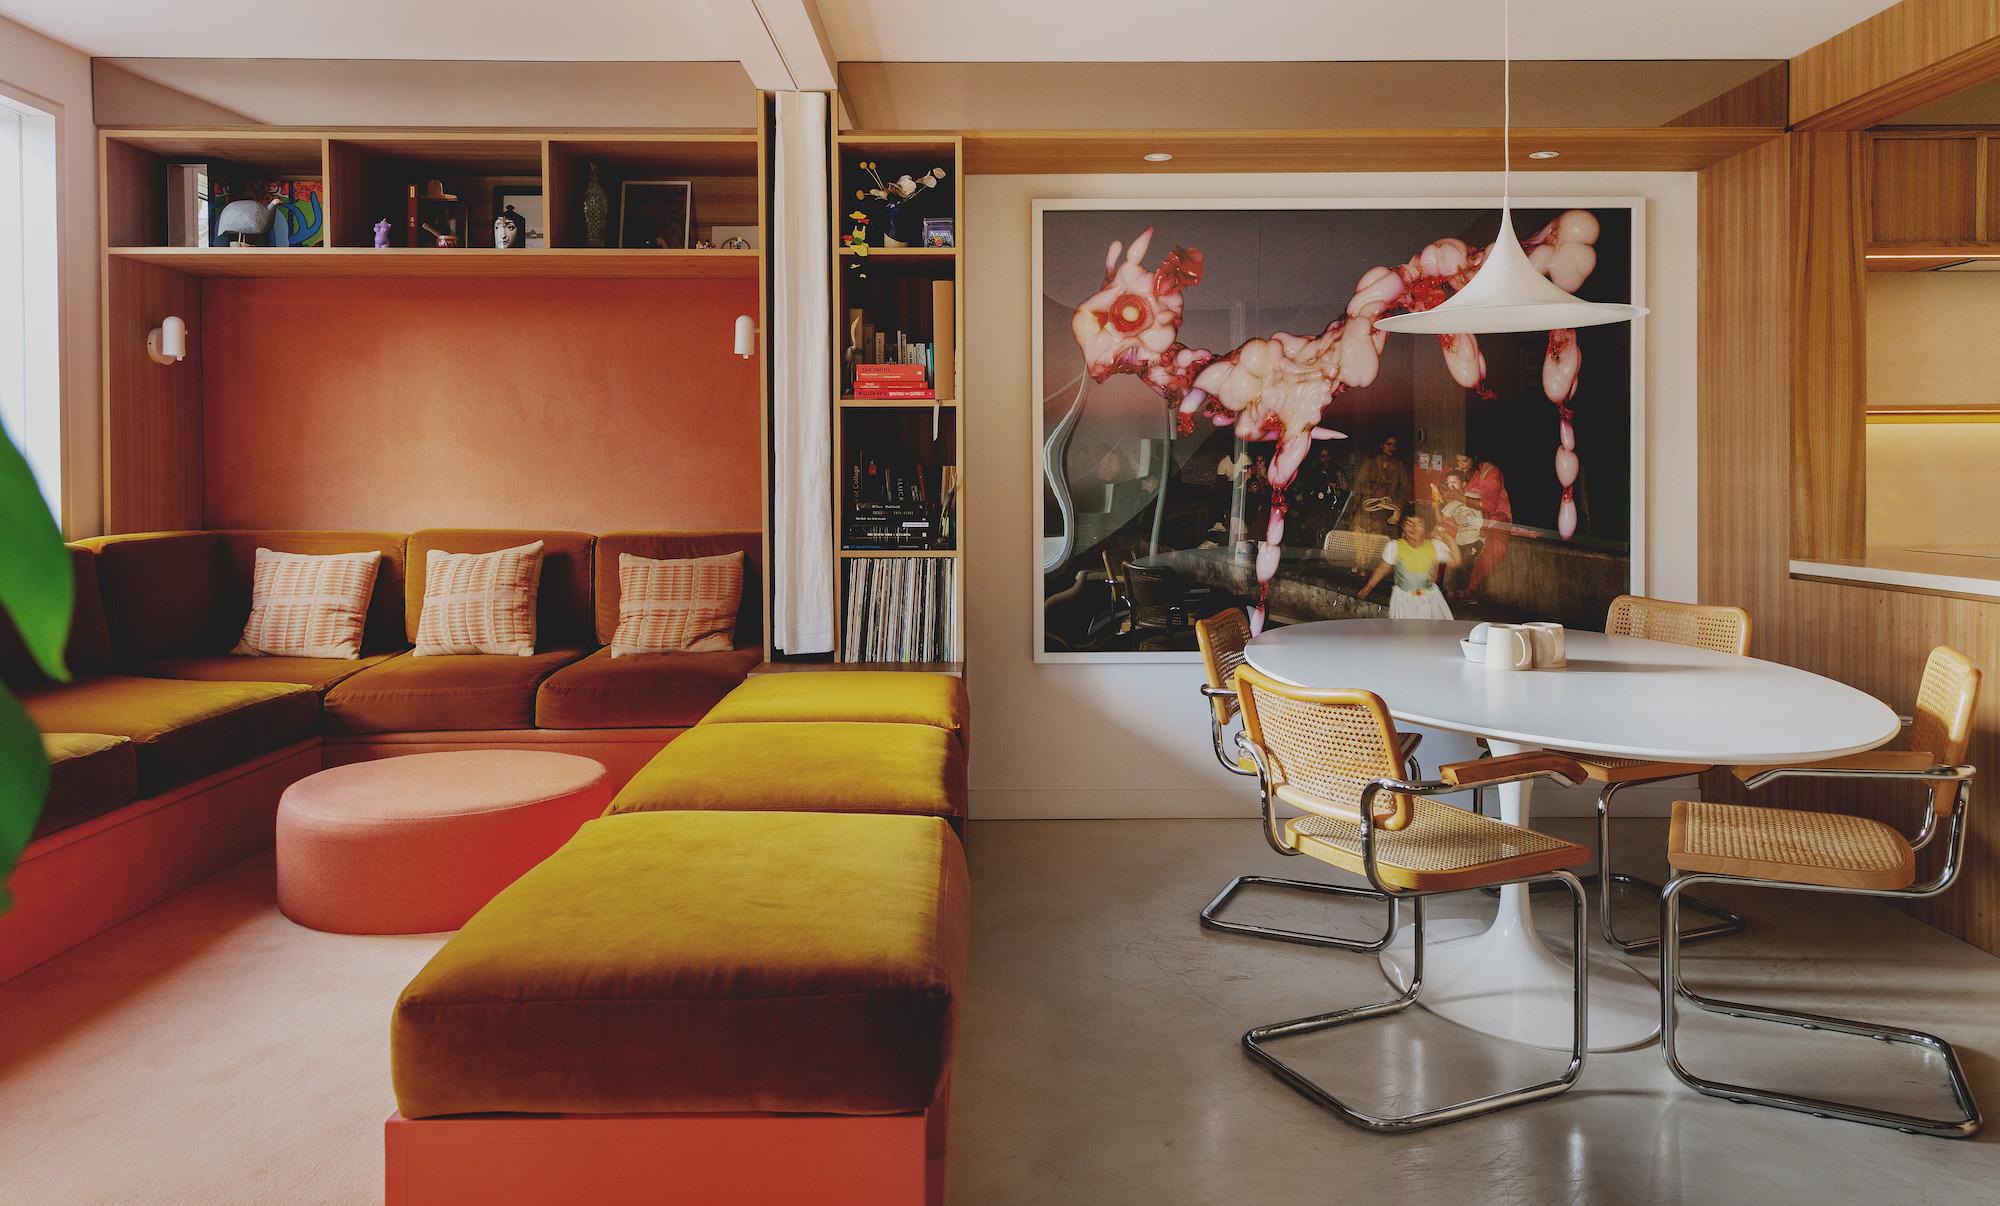 Studio Hagen Canyon House Hall Photo Mariell Lind Hansen Yellowtrace 02